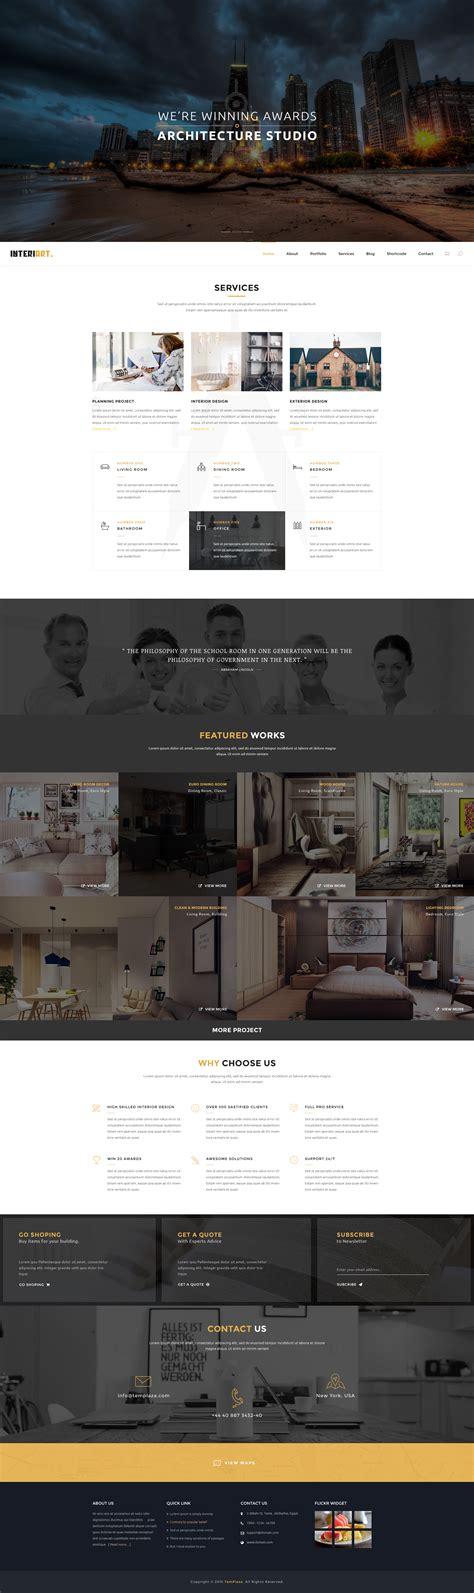 100 home shopping decor et design forum design